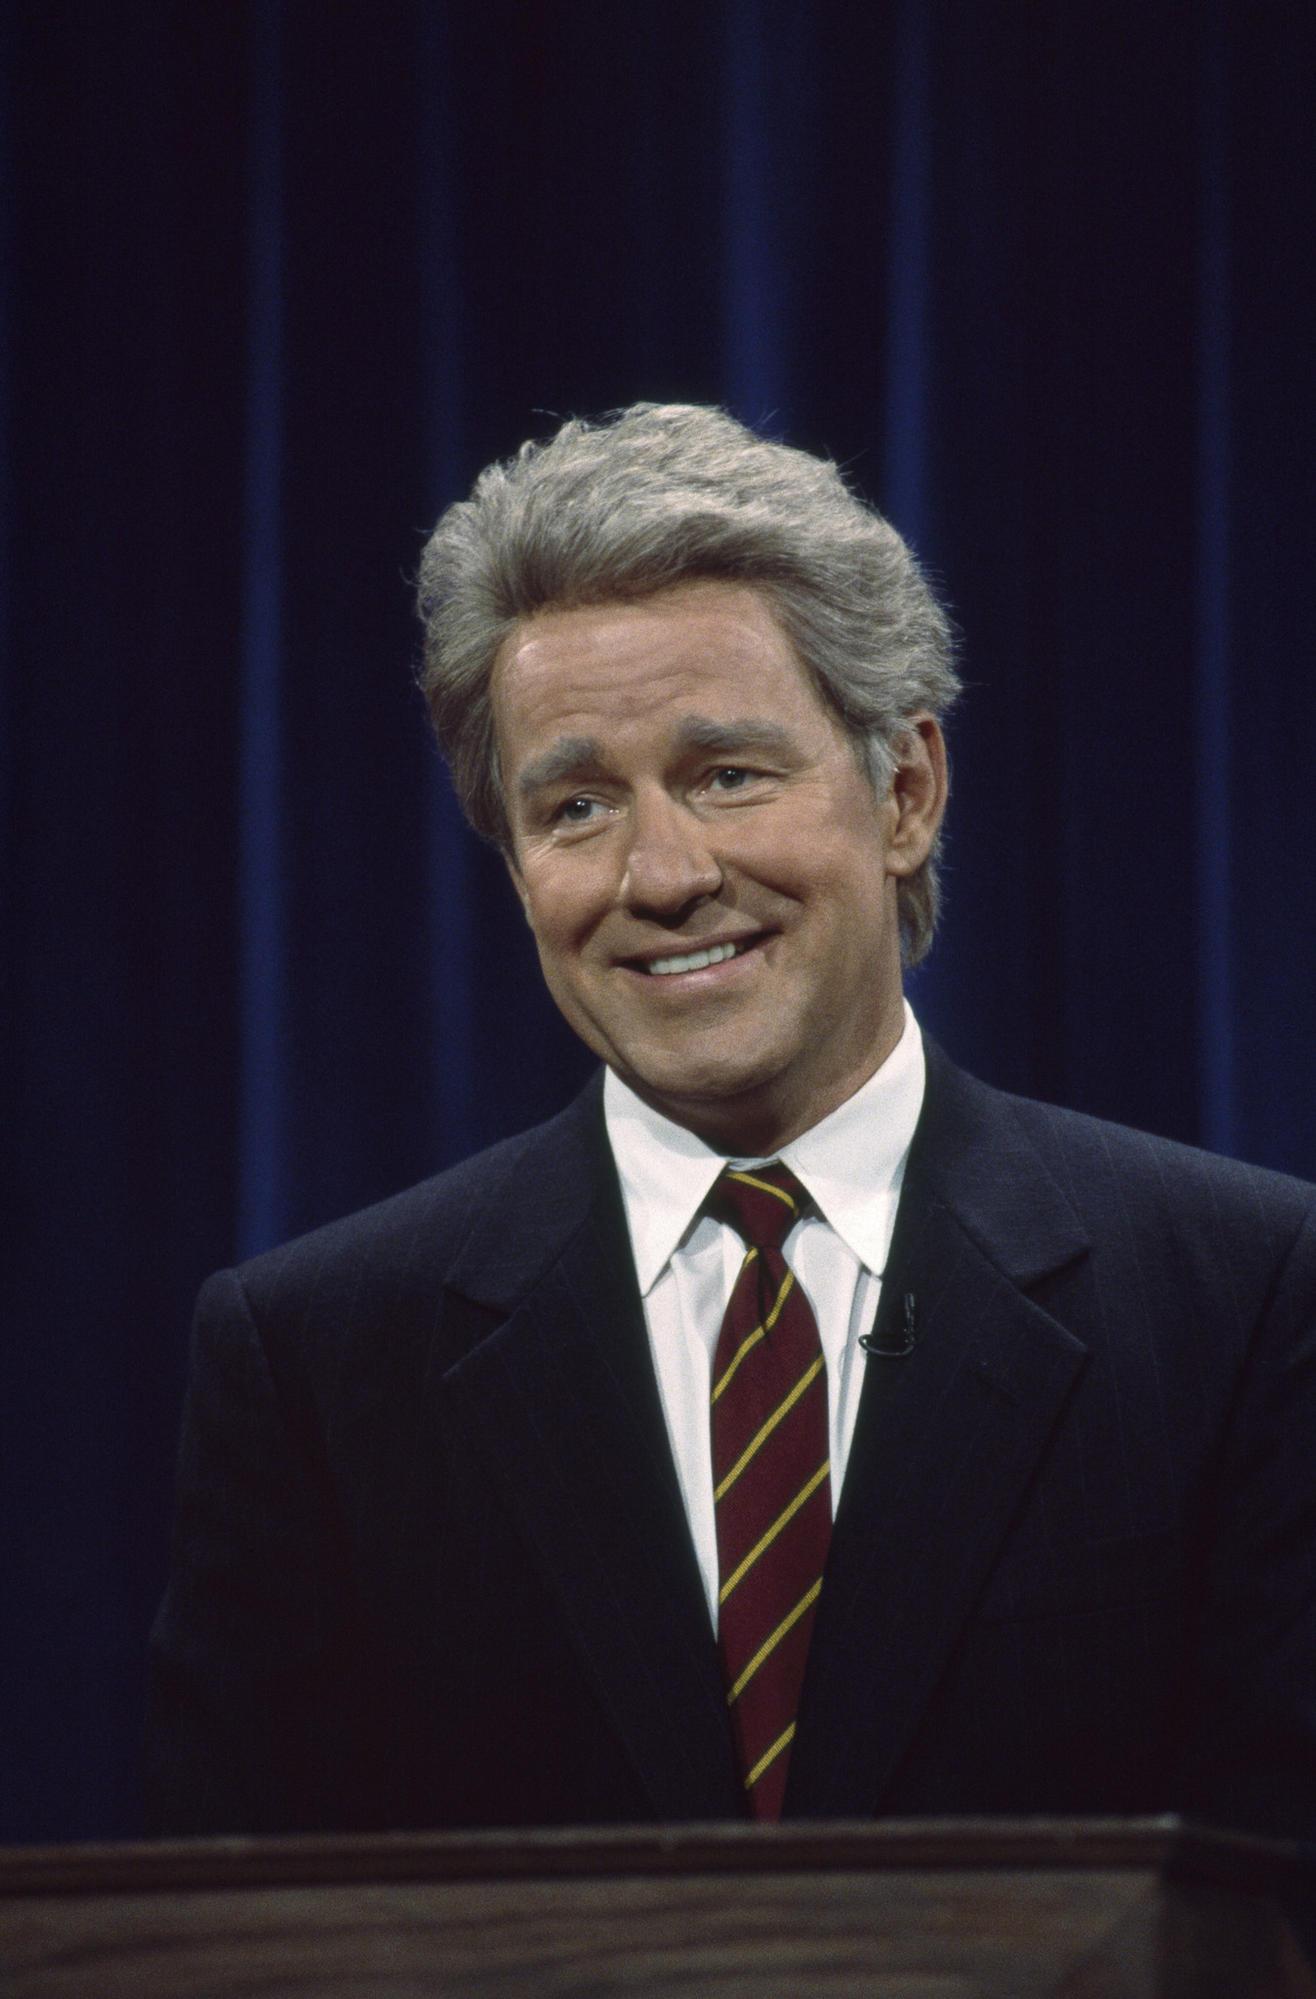 Phil Hartman as Bill Clinton